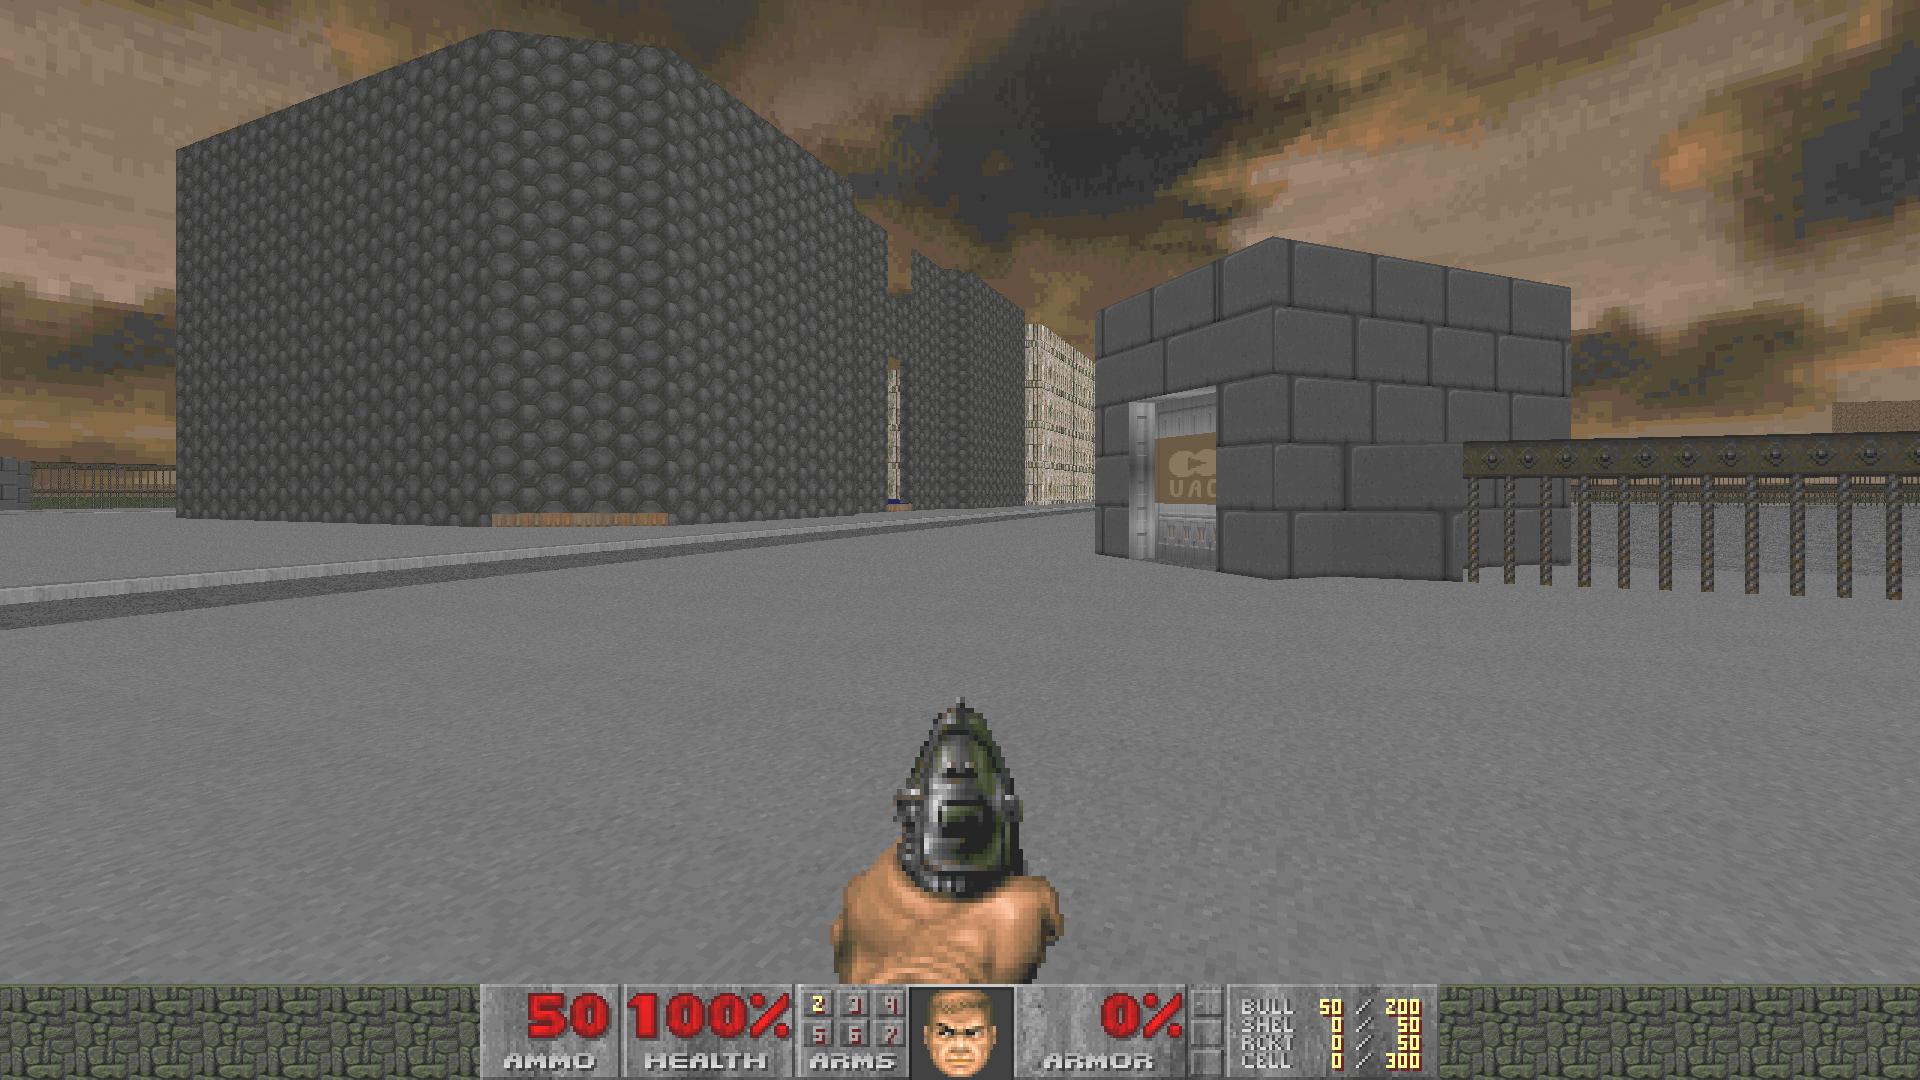 Screenshot_Doom_20200809_200602.png.b6c37b10b6d65e639d3e0bfb2a030508.png